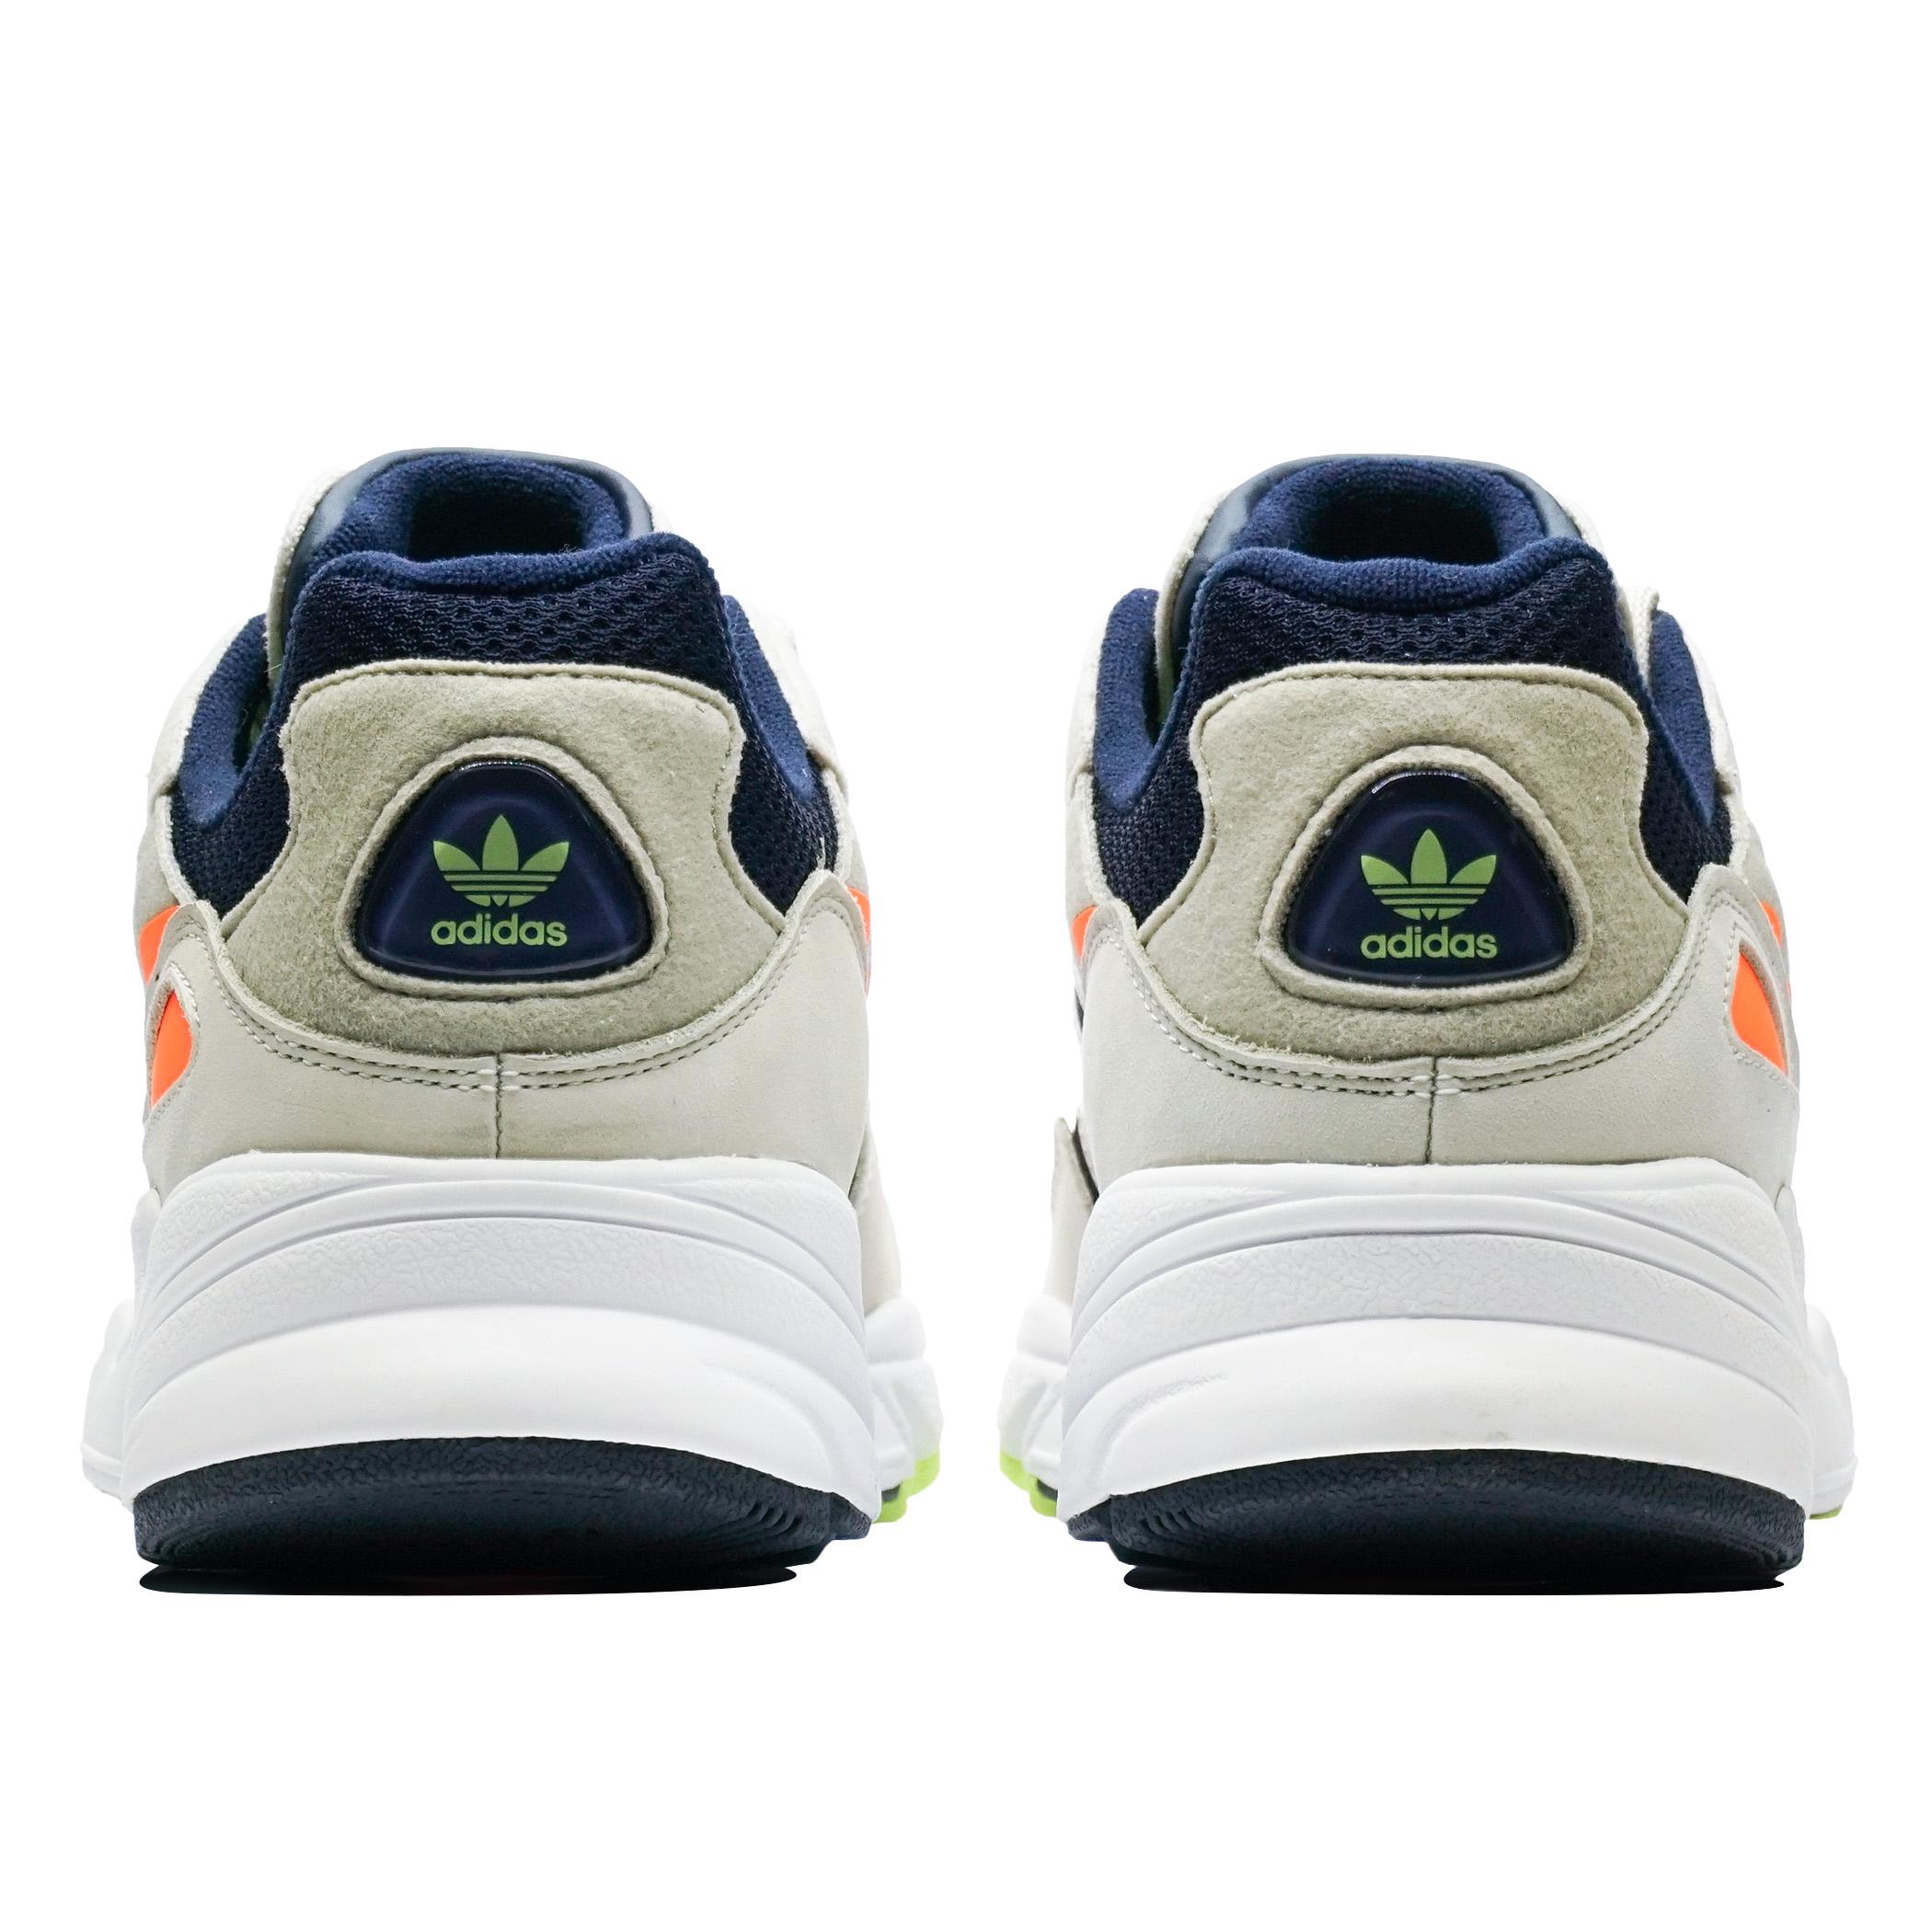 9c6b41d2 Мужские кроссовки adidas Originals Yung-96 Collegiate Navy/Raw White,/Solar  Orange